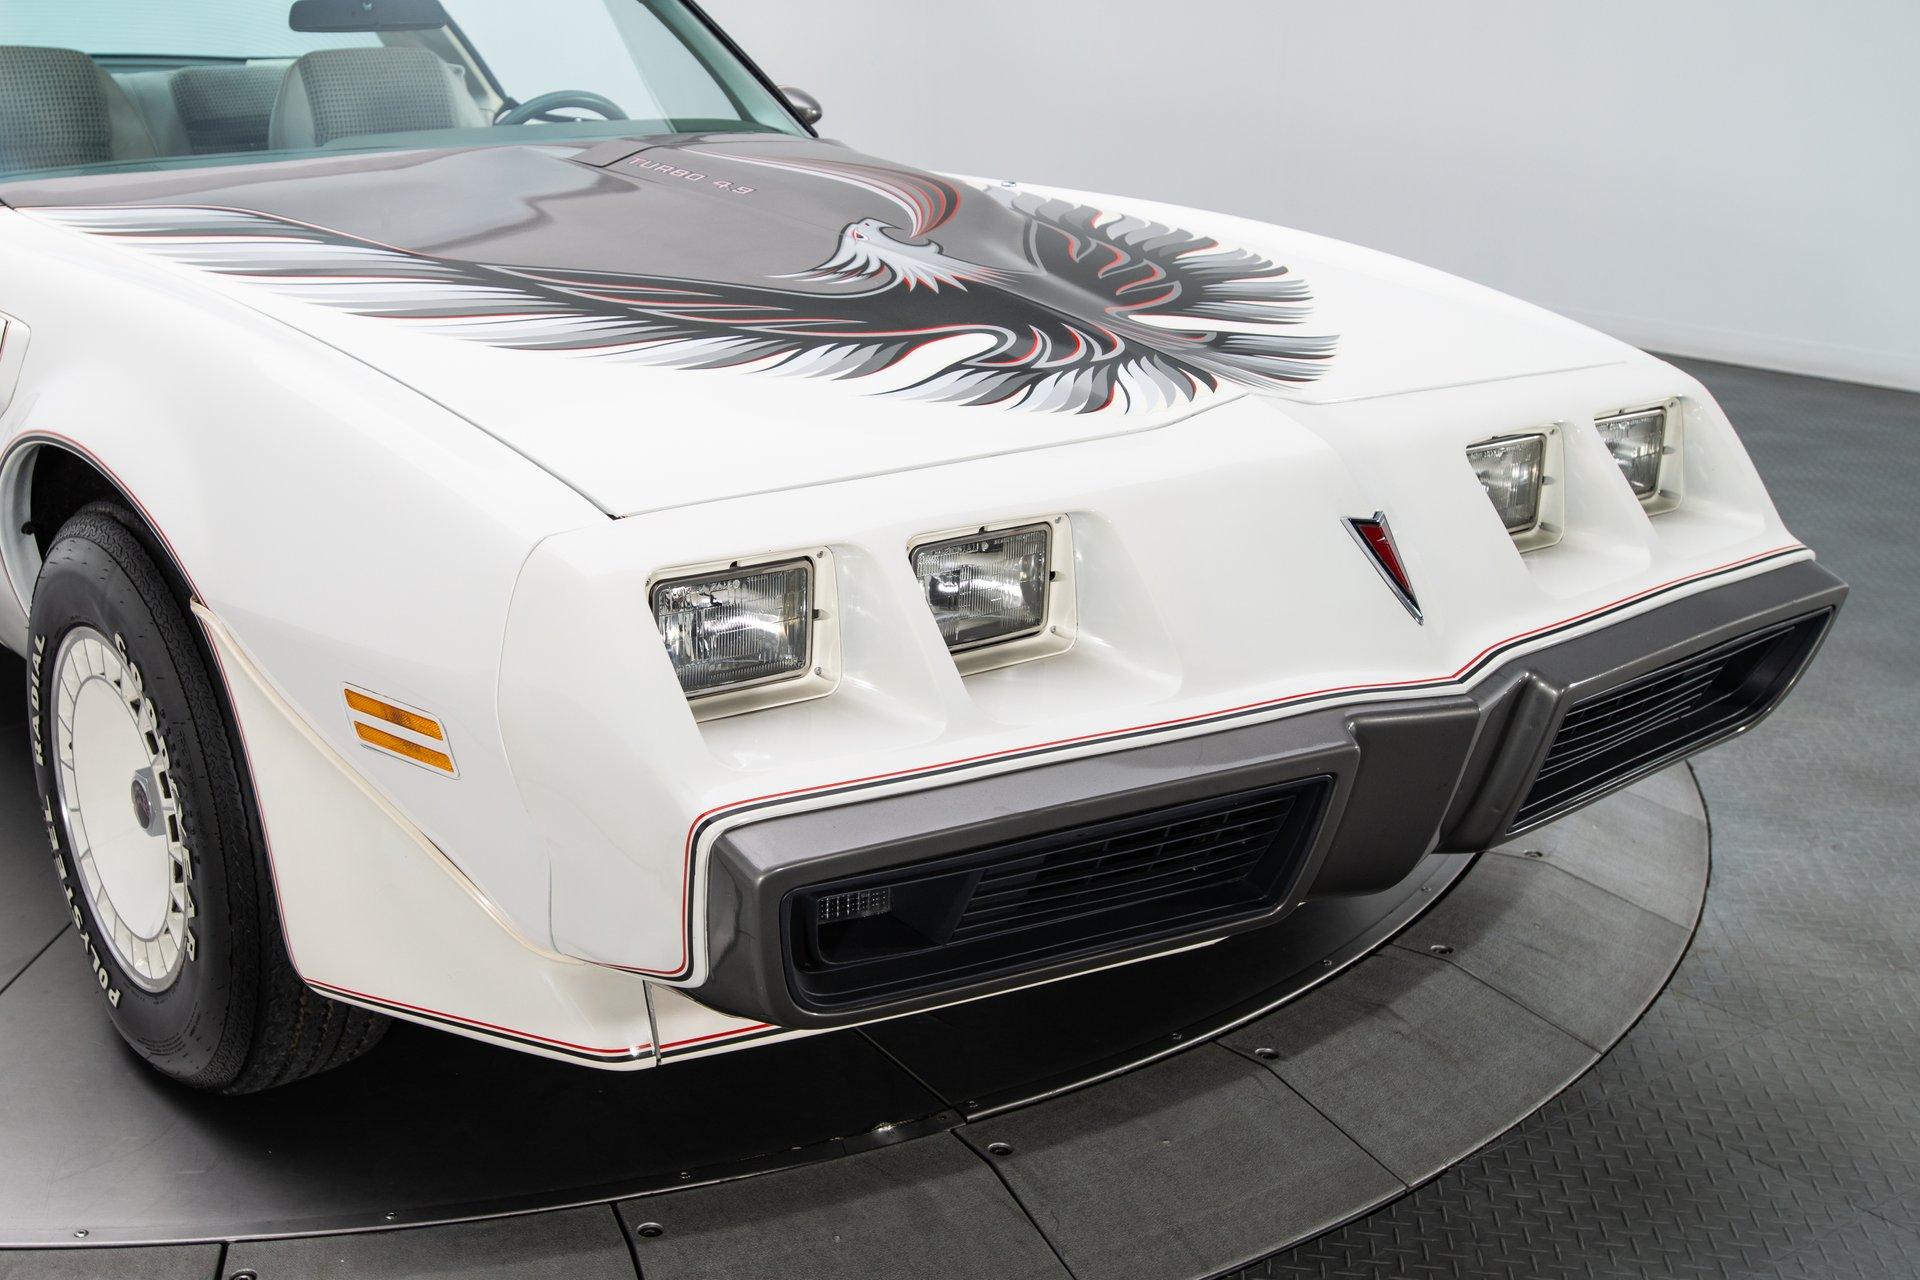 136225 1980 Pontiac Firebird Trans Am Pace Car RK Motors Classic